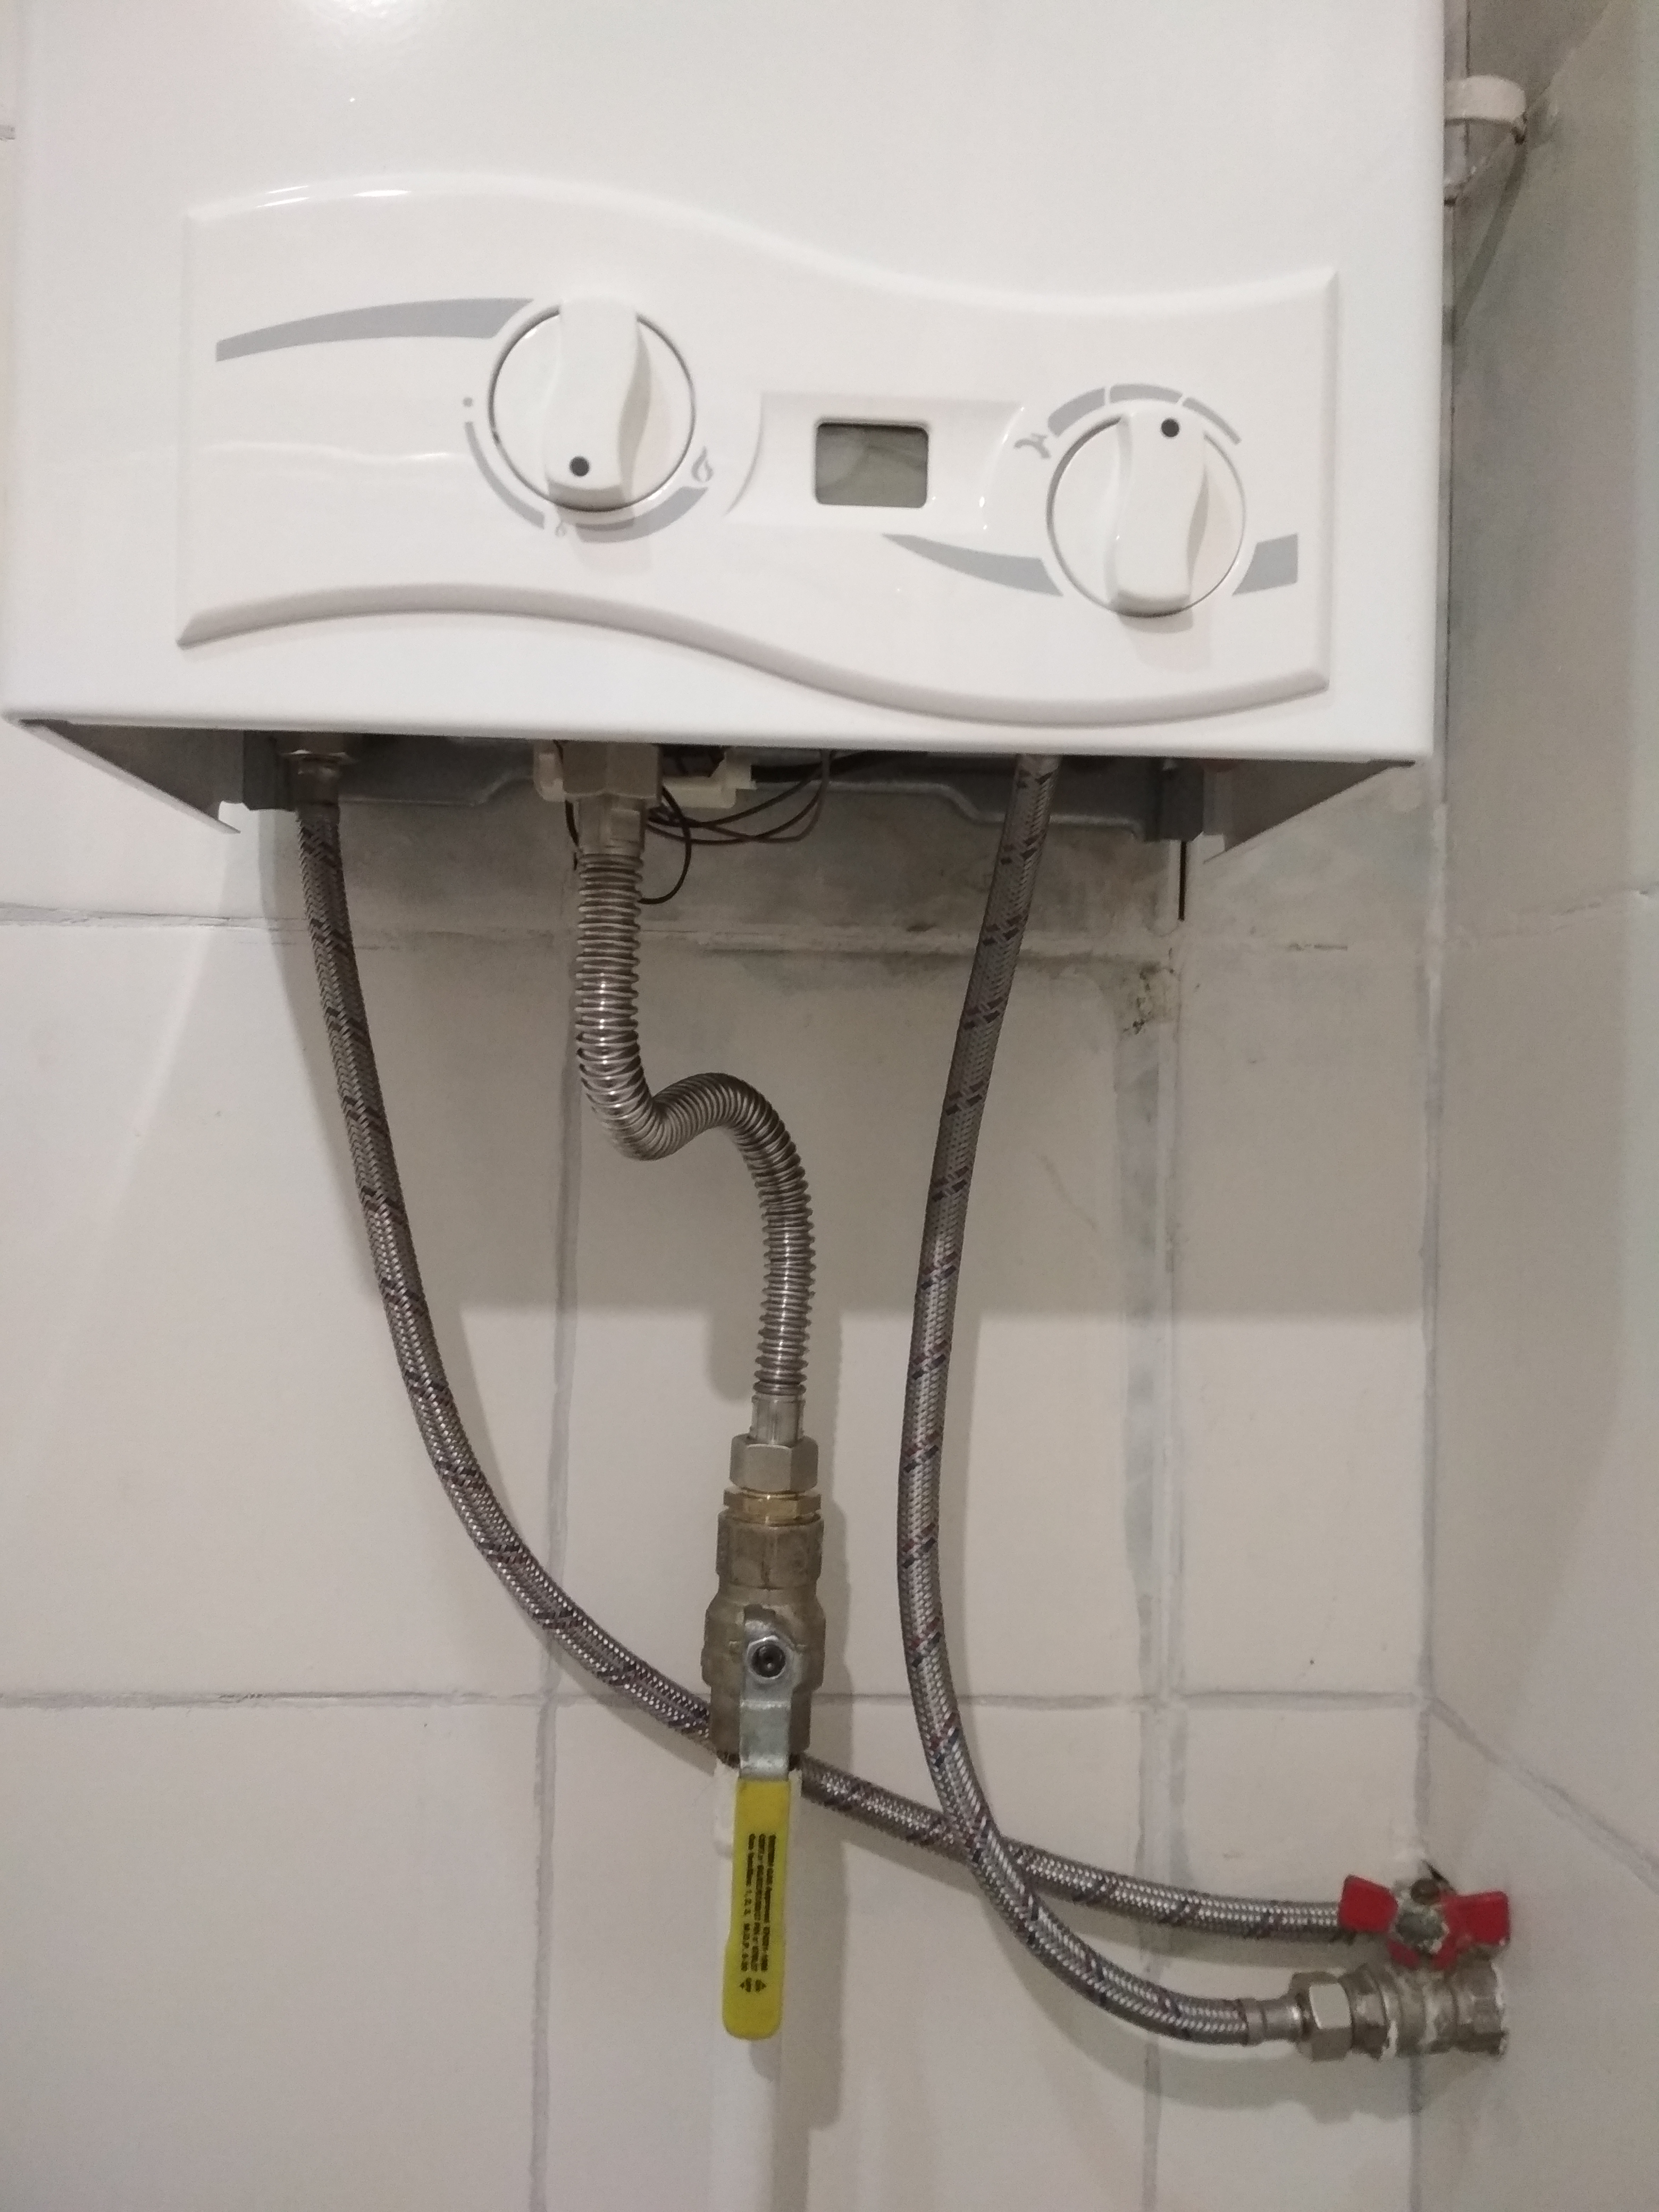 Фото Установка газовой колонки и её подключение.